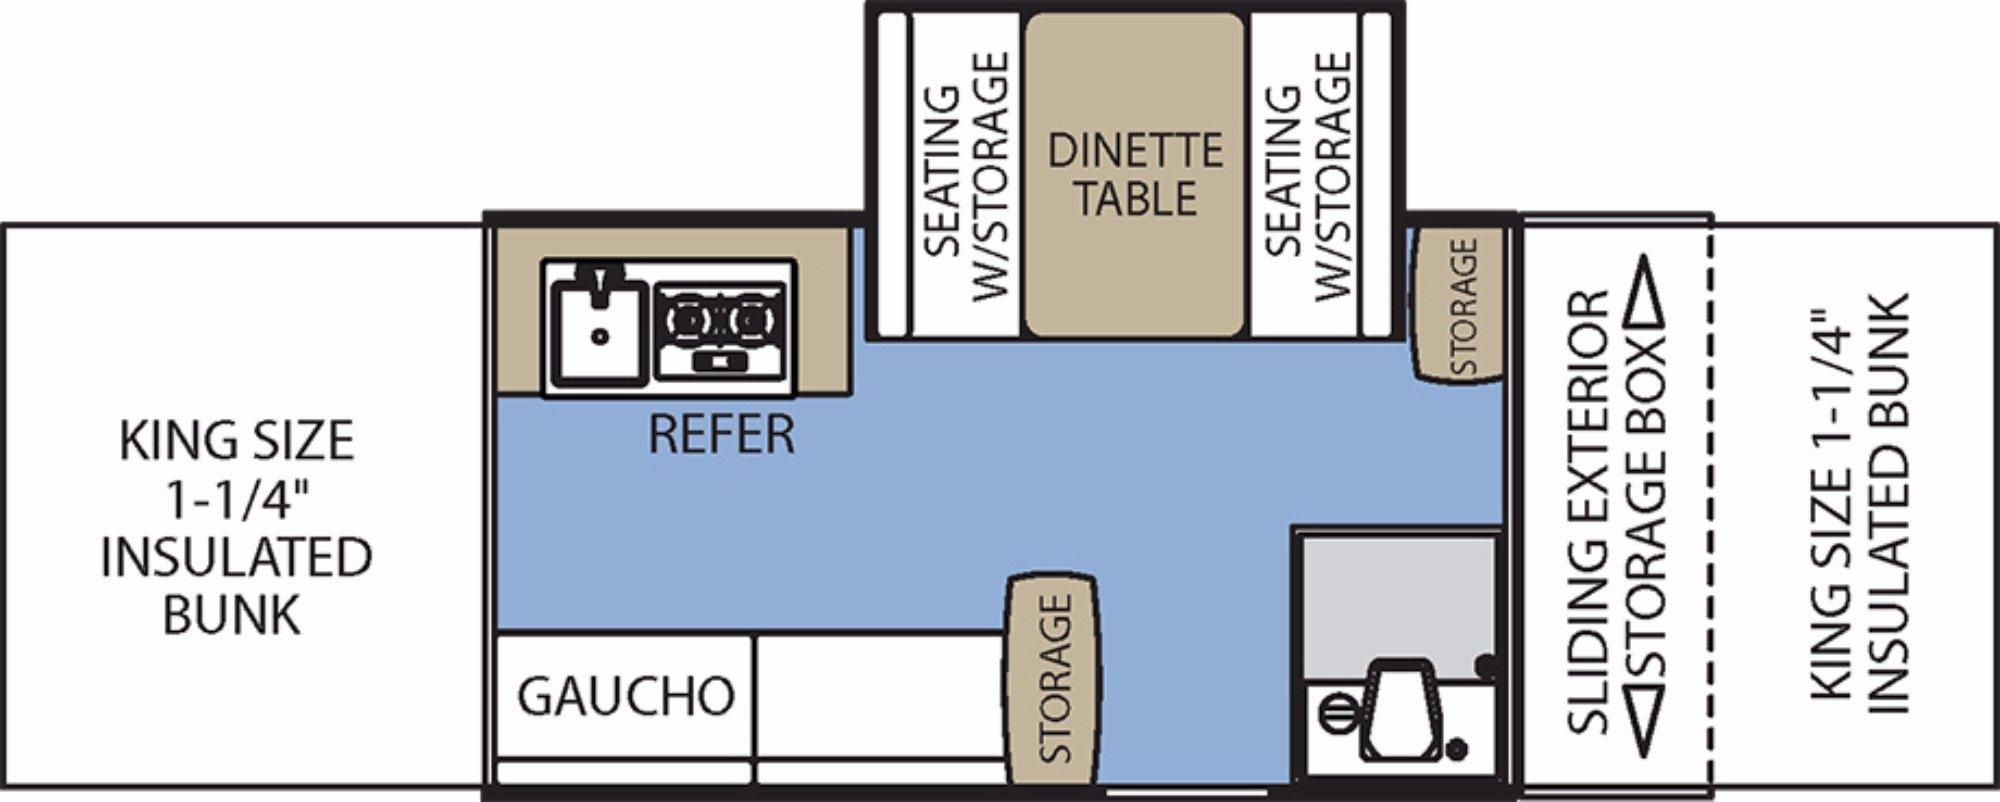 View Floor Plan for 2017 COACHMEN CLIPPER 1285SST